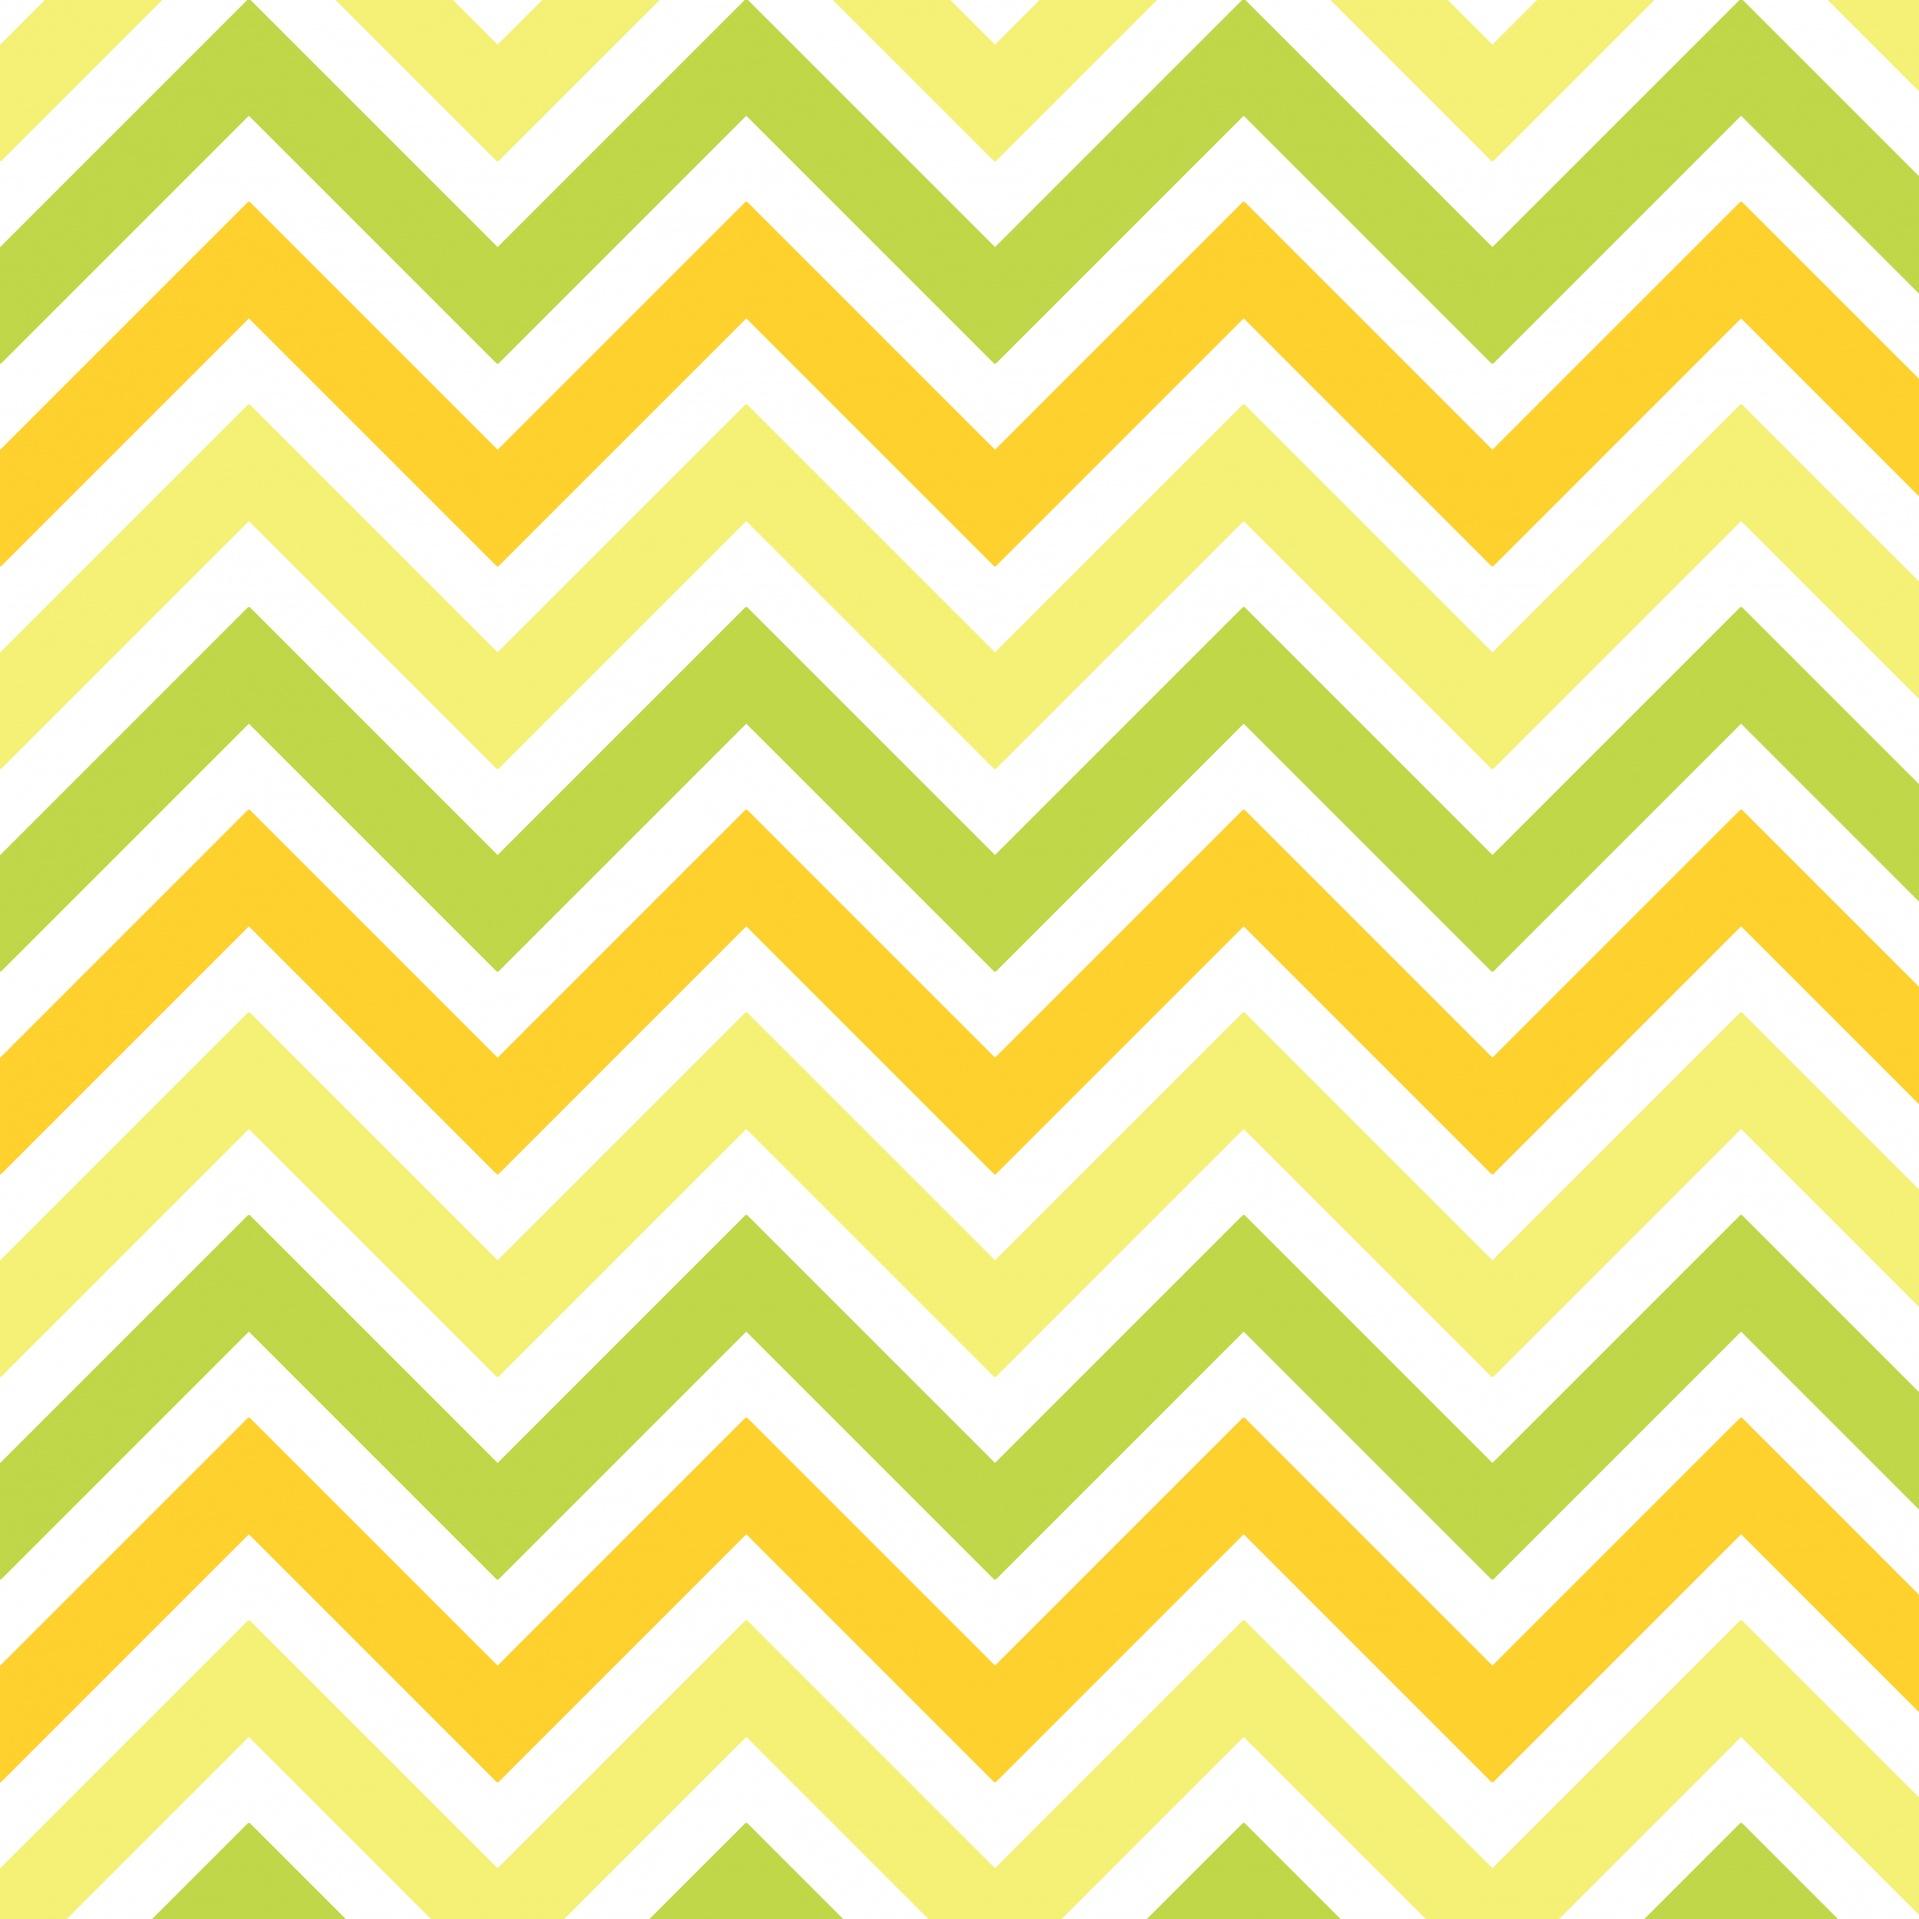 Chevrons Zig Zags Zigzags Yellow Green Free Photo From Needpix Com